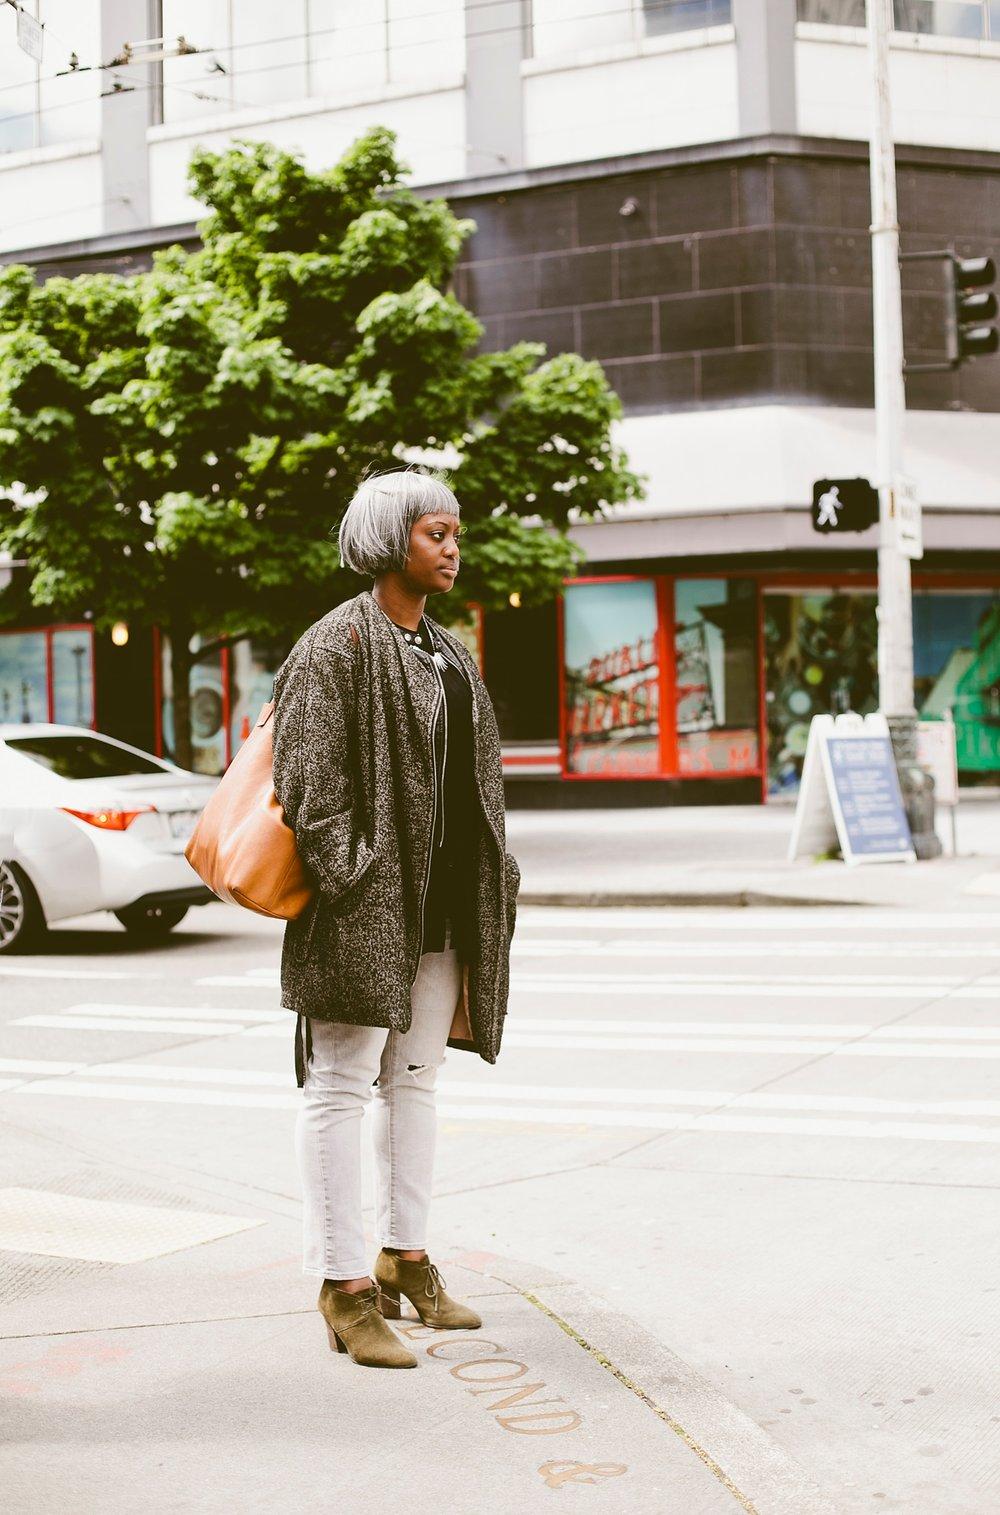 Seattle_Lifestyle_Photographer_011.jpg